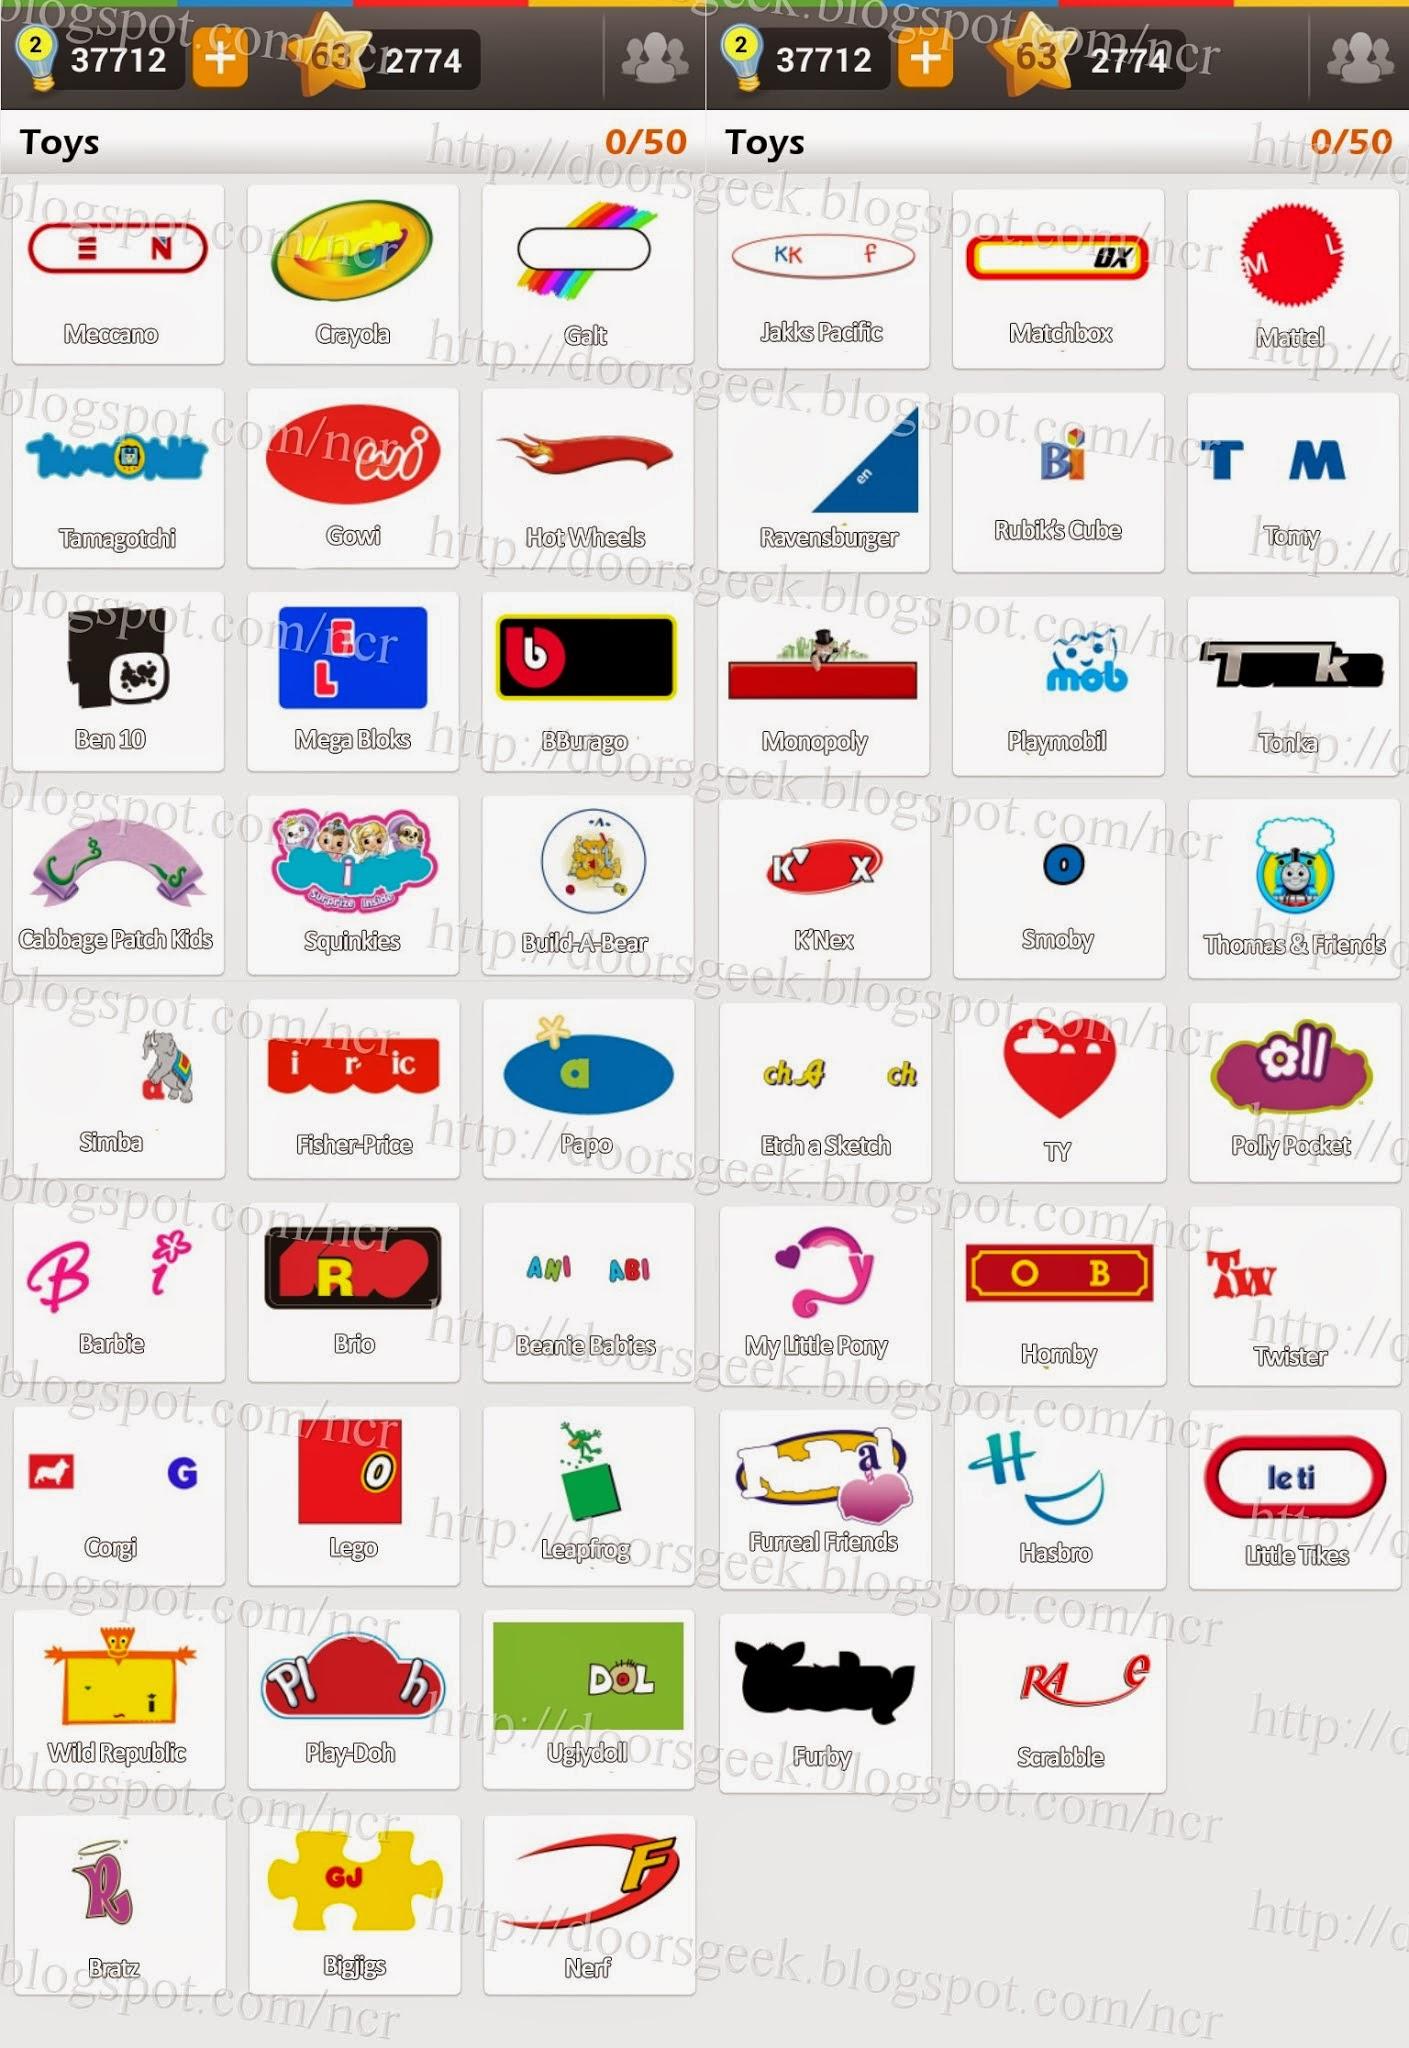 Logo Game: Guess the Brand [Bonus] Toys ~ Doors Geek: http://doorsgeek.blogspot.com/2014/05/logo-game-guess-brand-bonus-toys.html